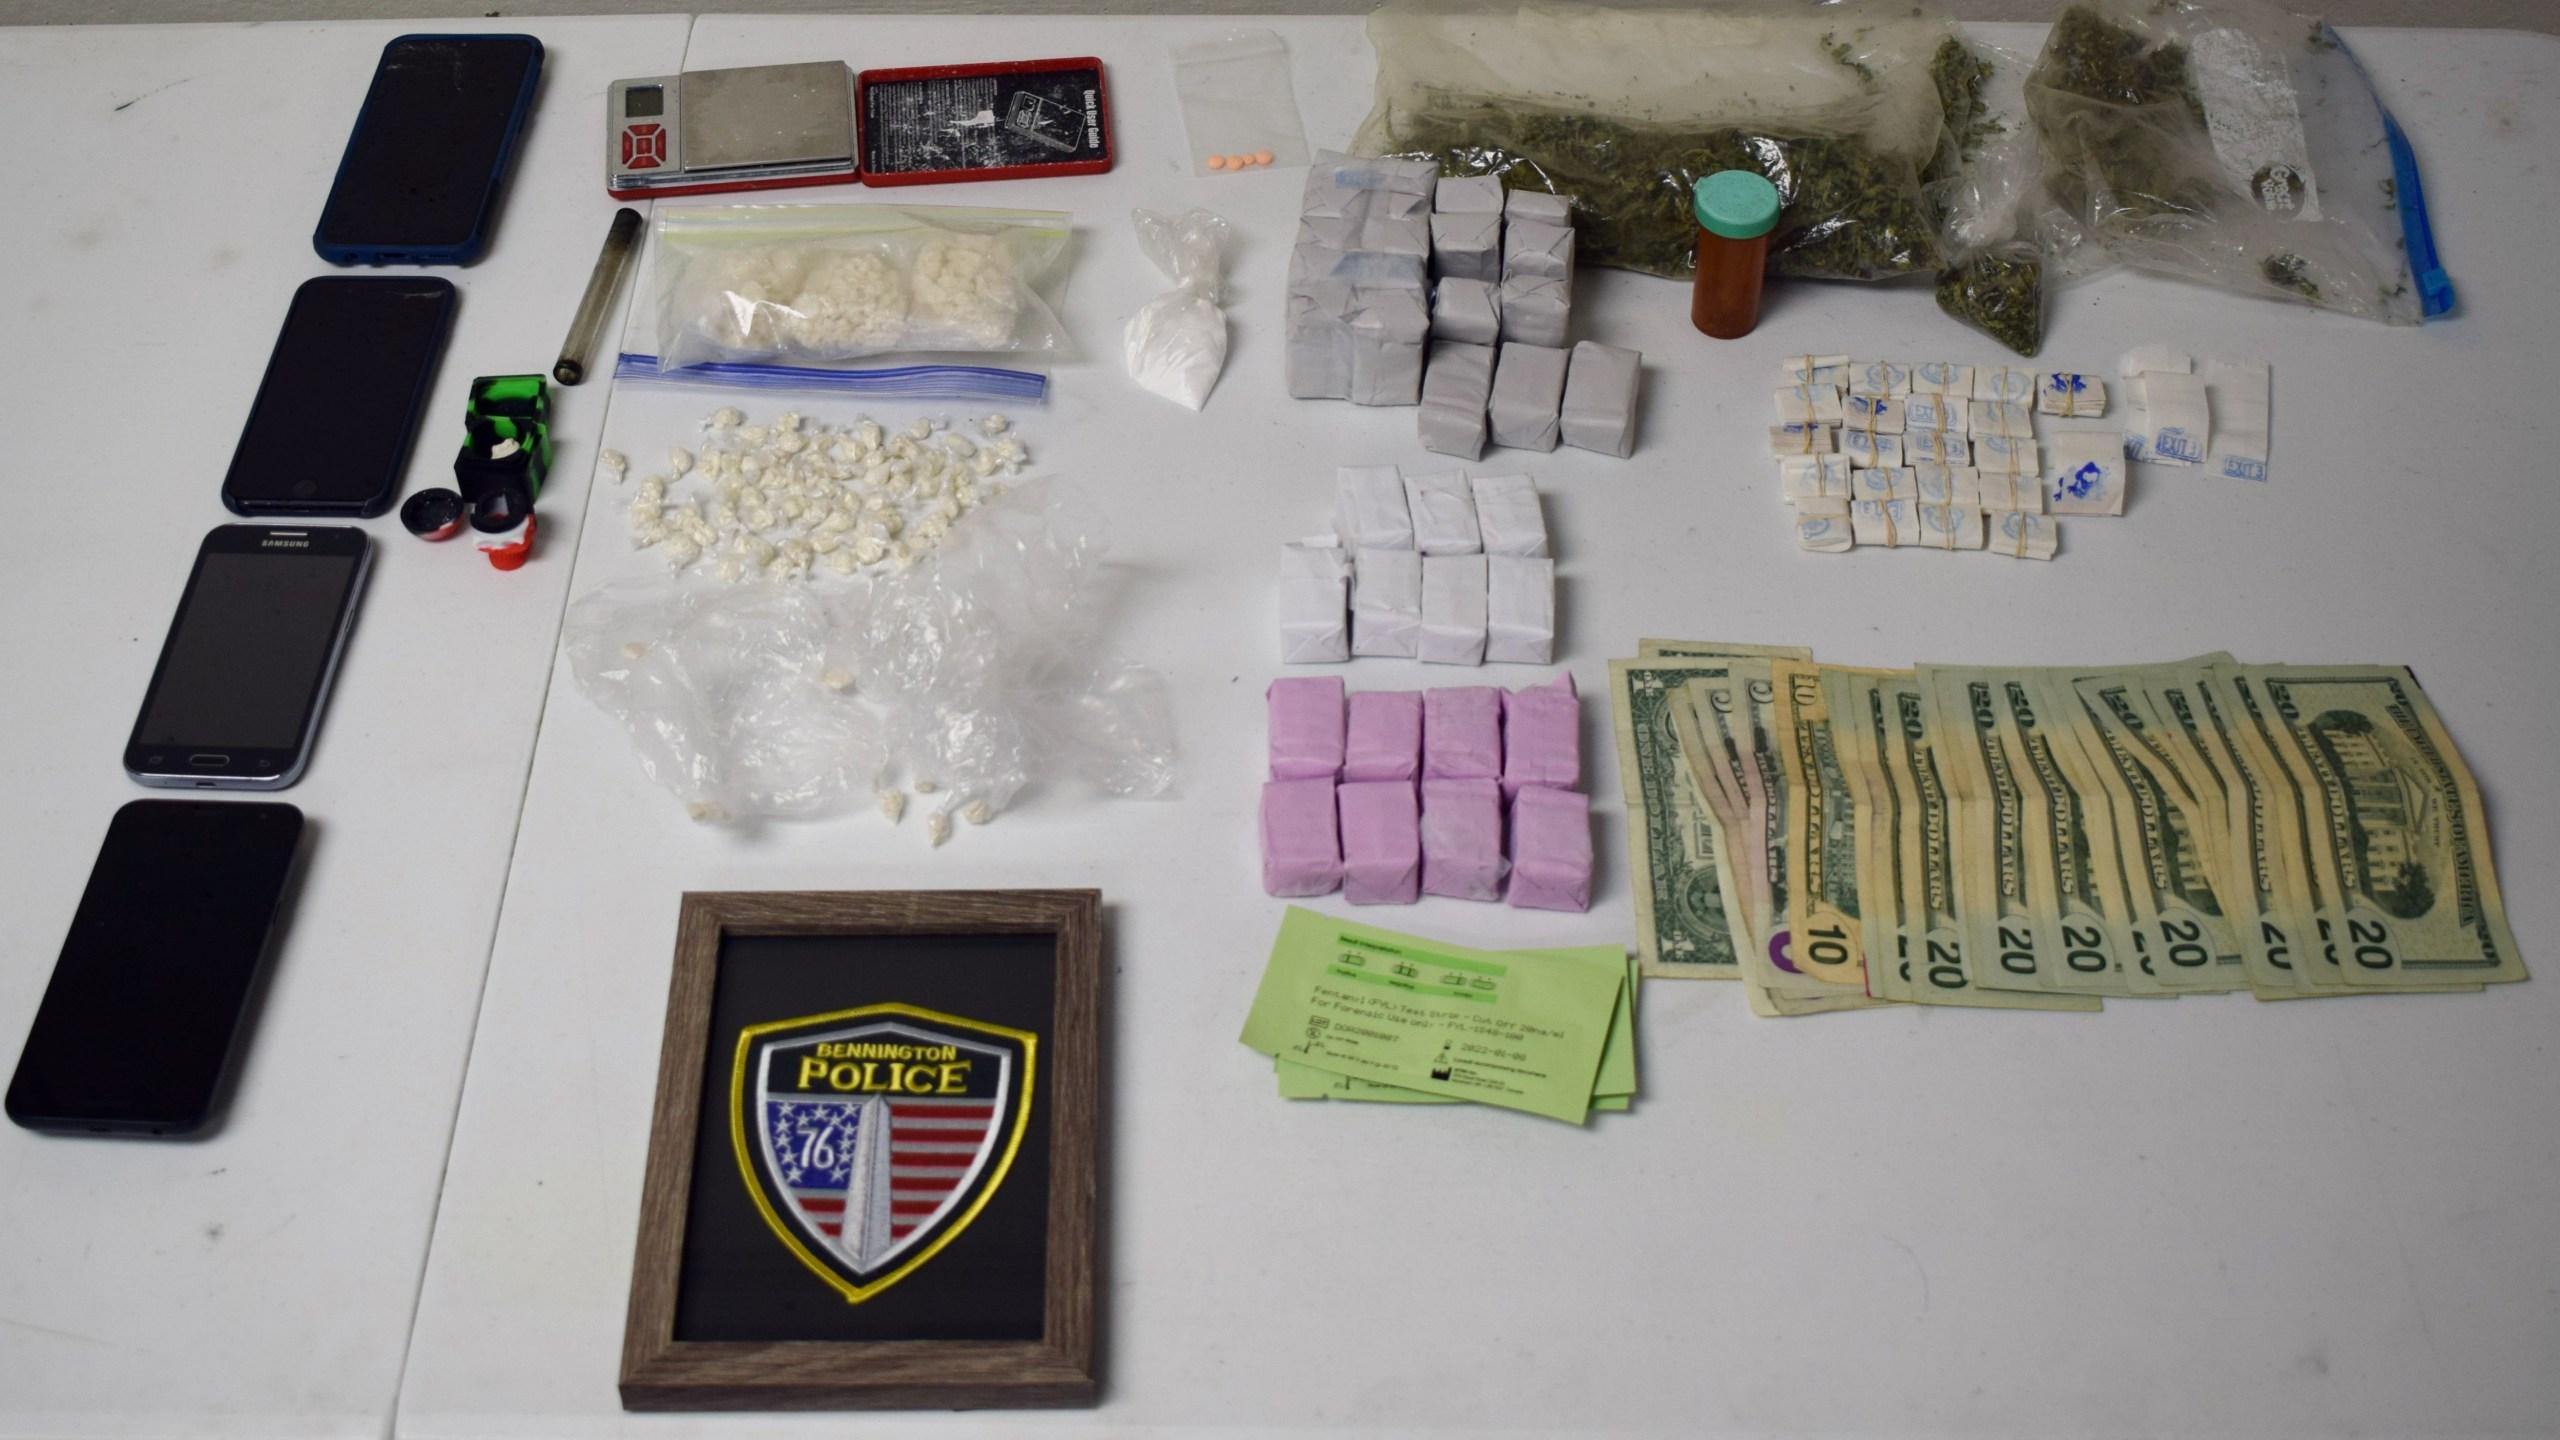 Search warrant yields drugs and paraphernalia in Bennington (Bennington PD)